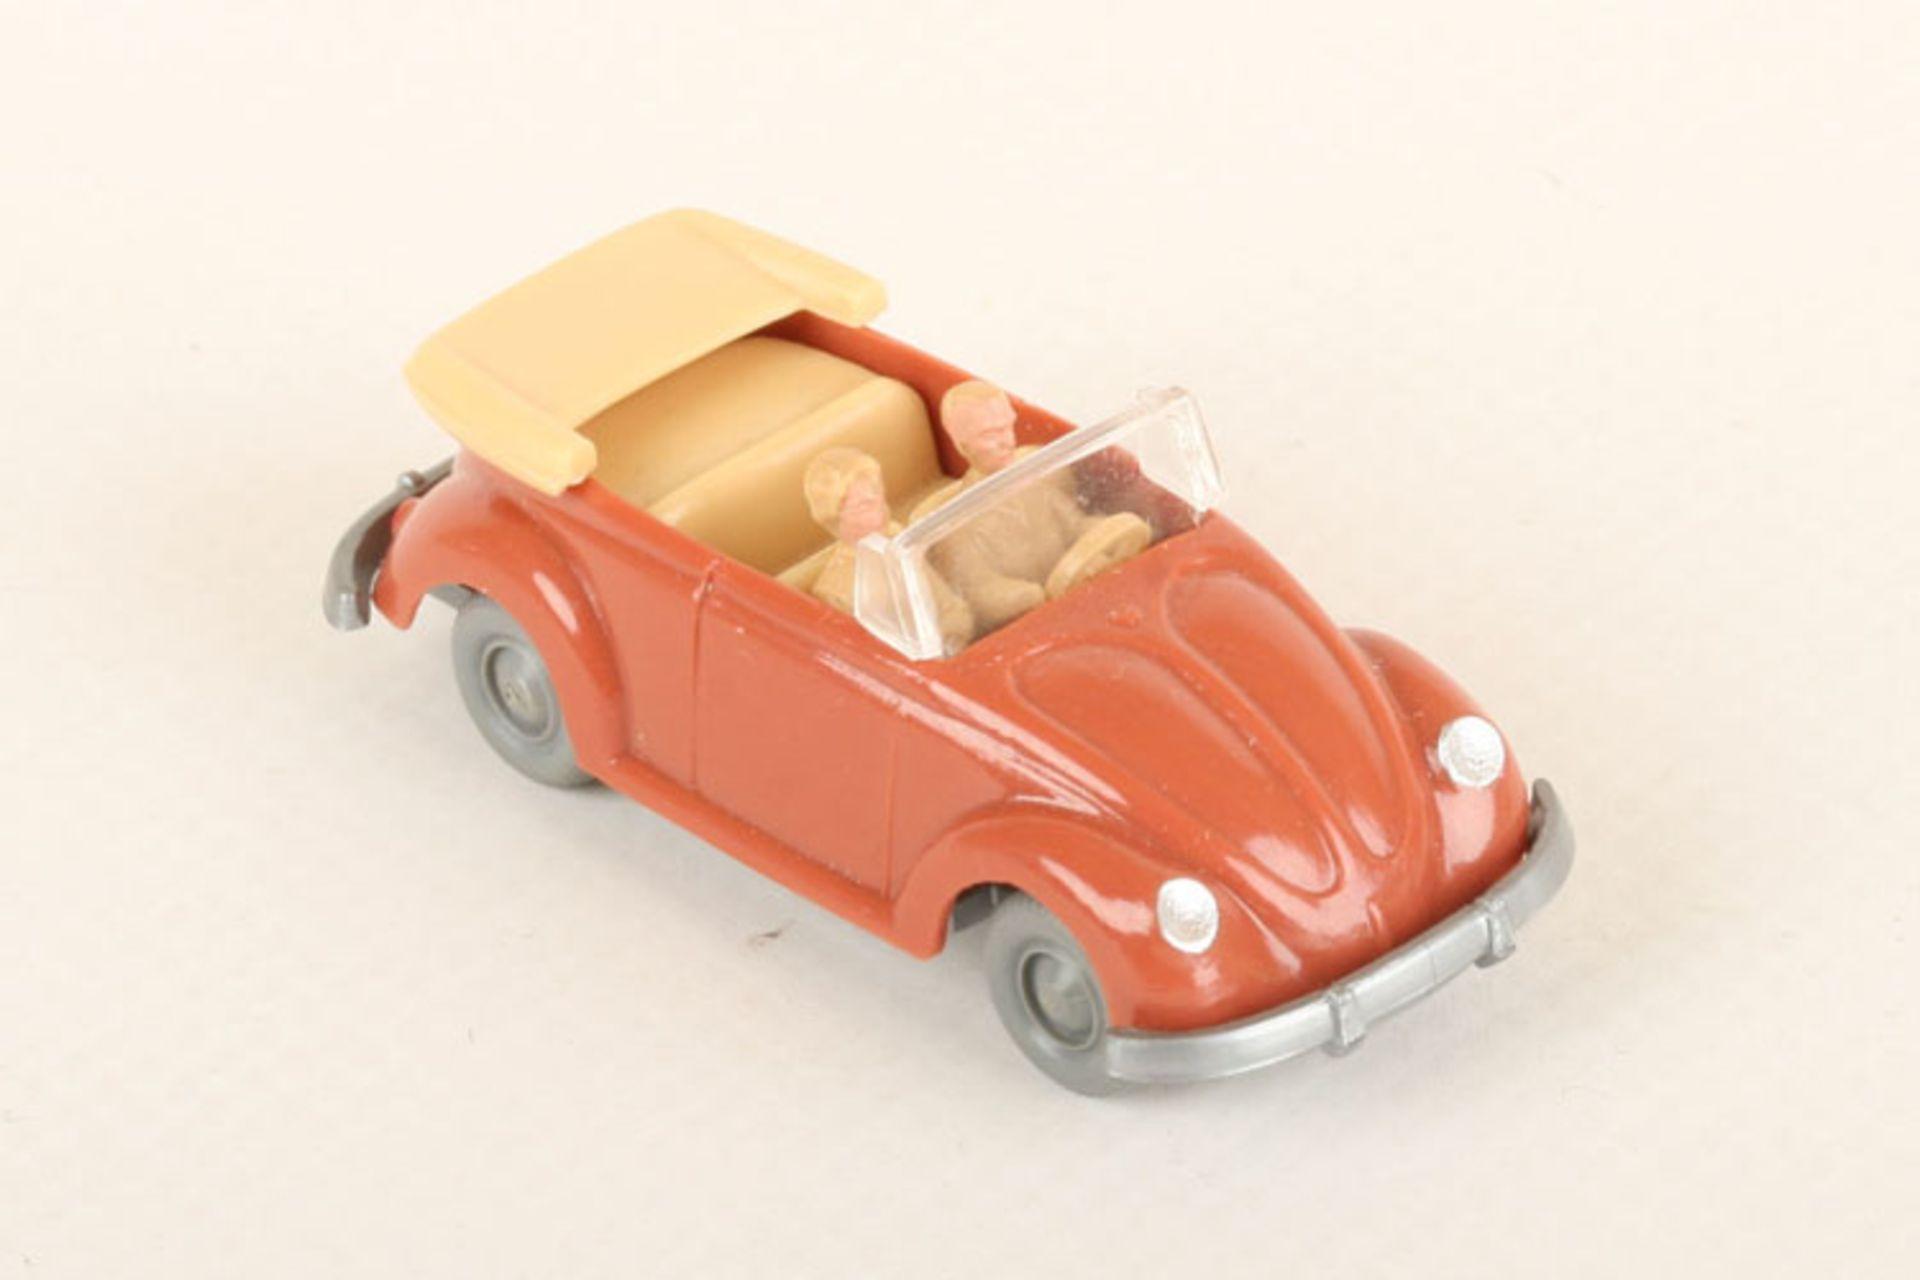 Los 1018 - Wiking VW Käfer Cabrio korallenrot 33/6b, IE h'beige, neuwertig